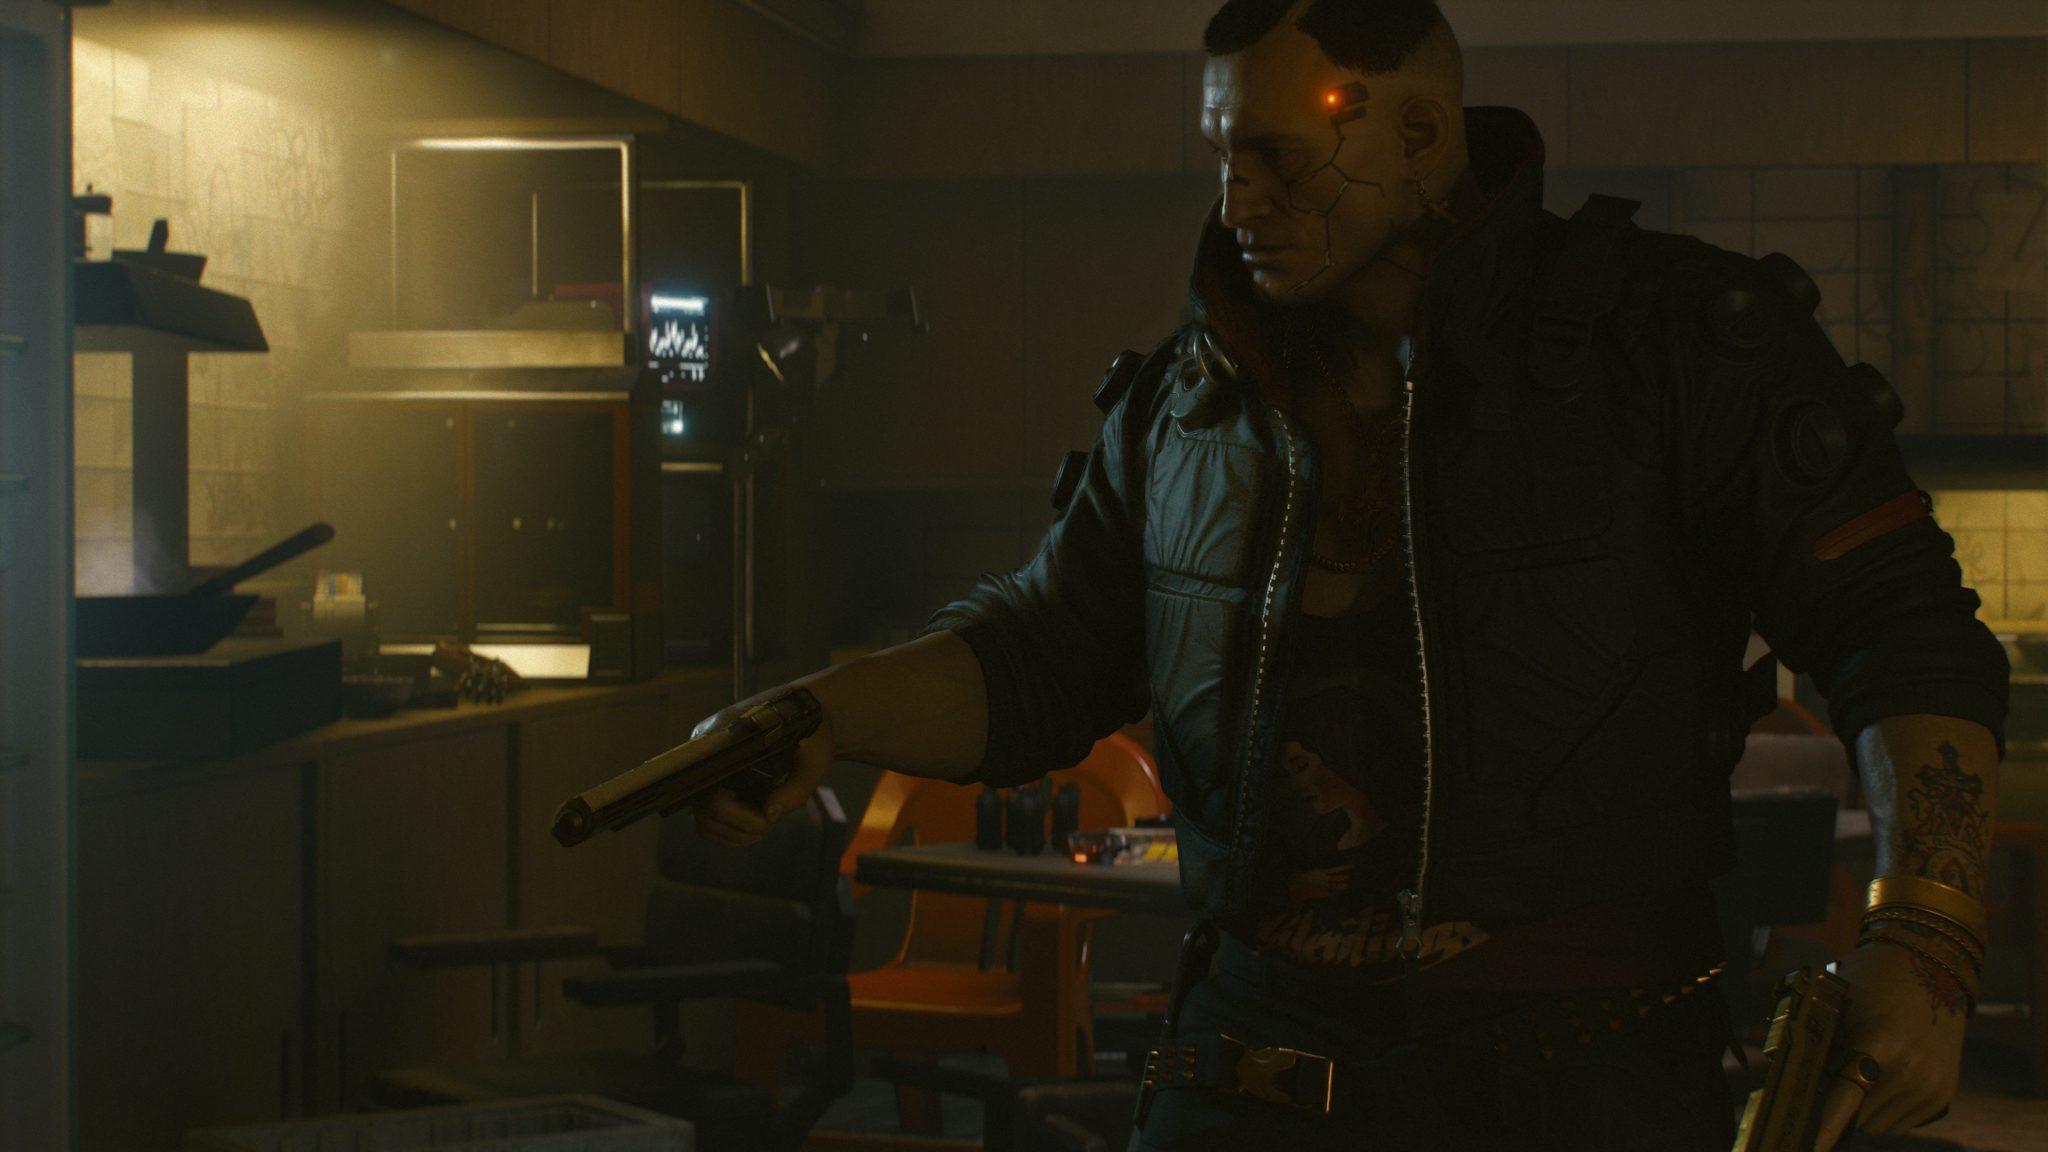 The Cyberpunk 2077 E3 Demo Ran On A Modern Yet Achievably Specced